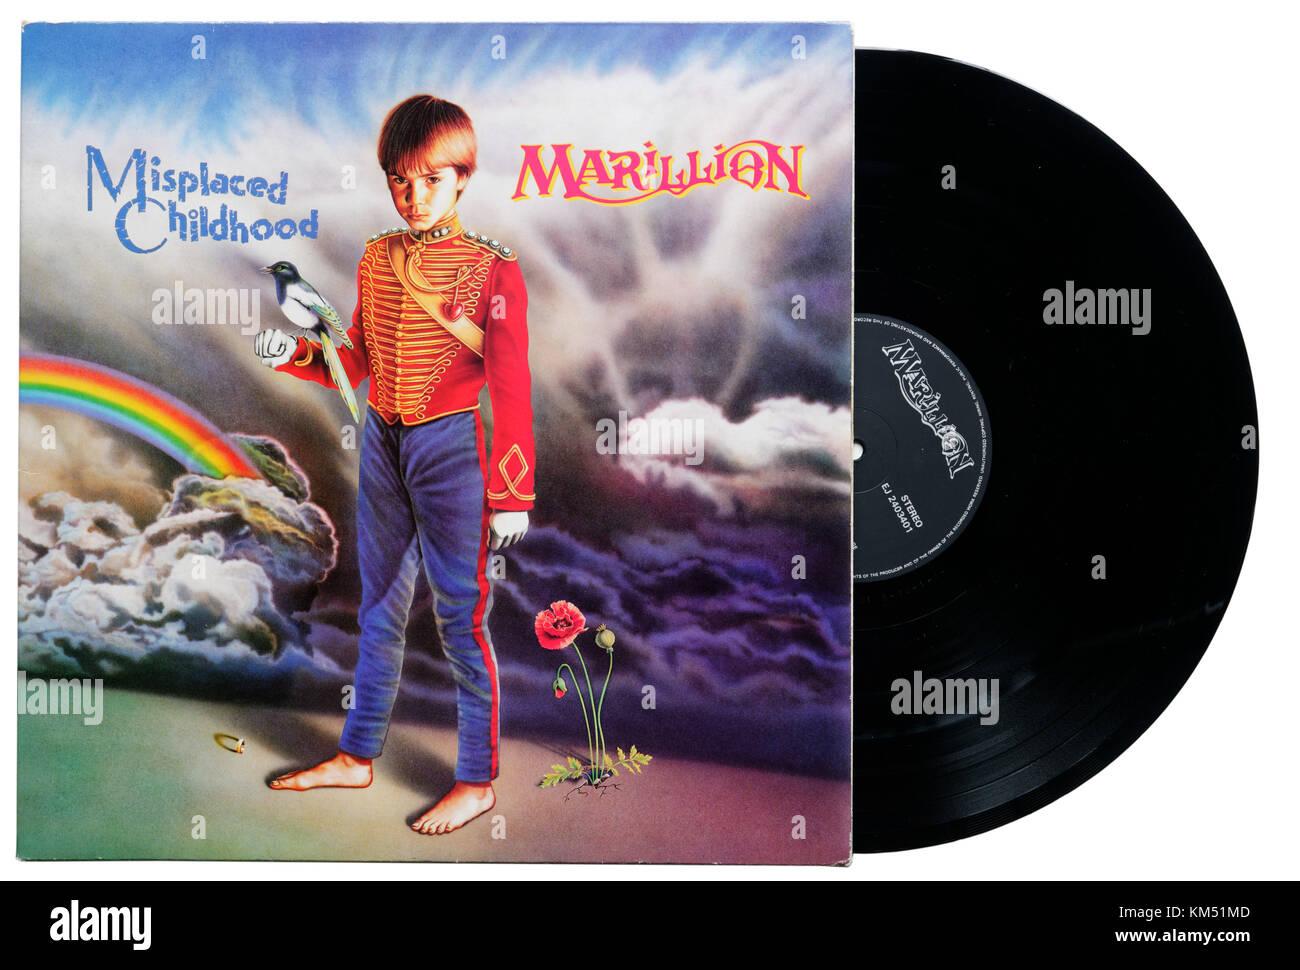 Marillion Misplaced Childhood album - Stock Image